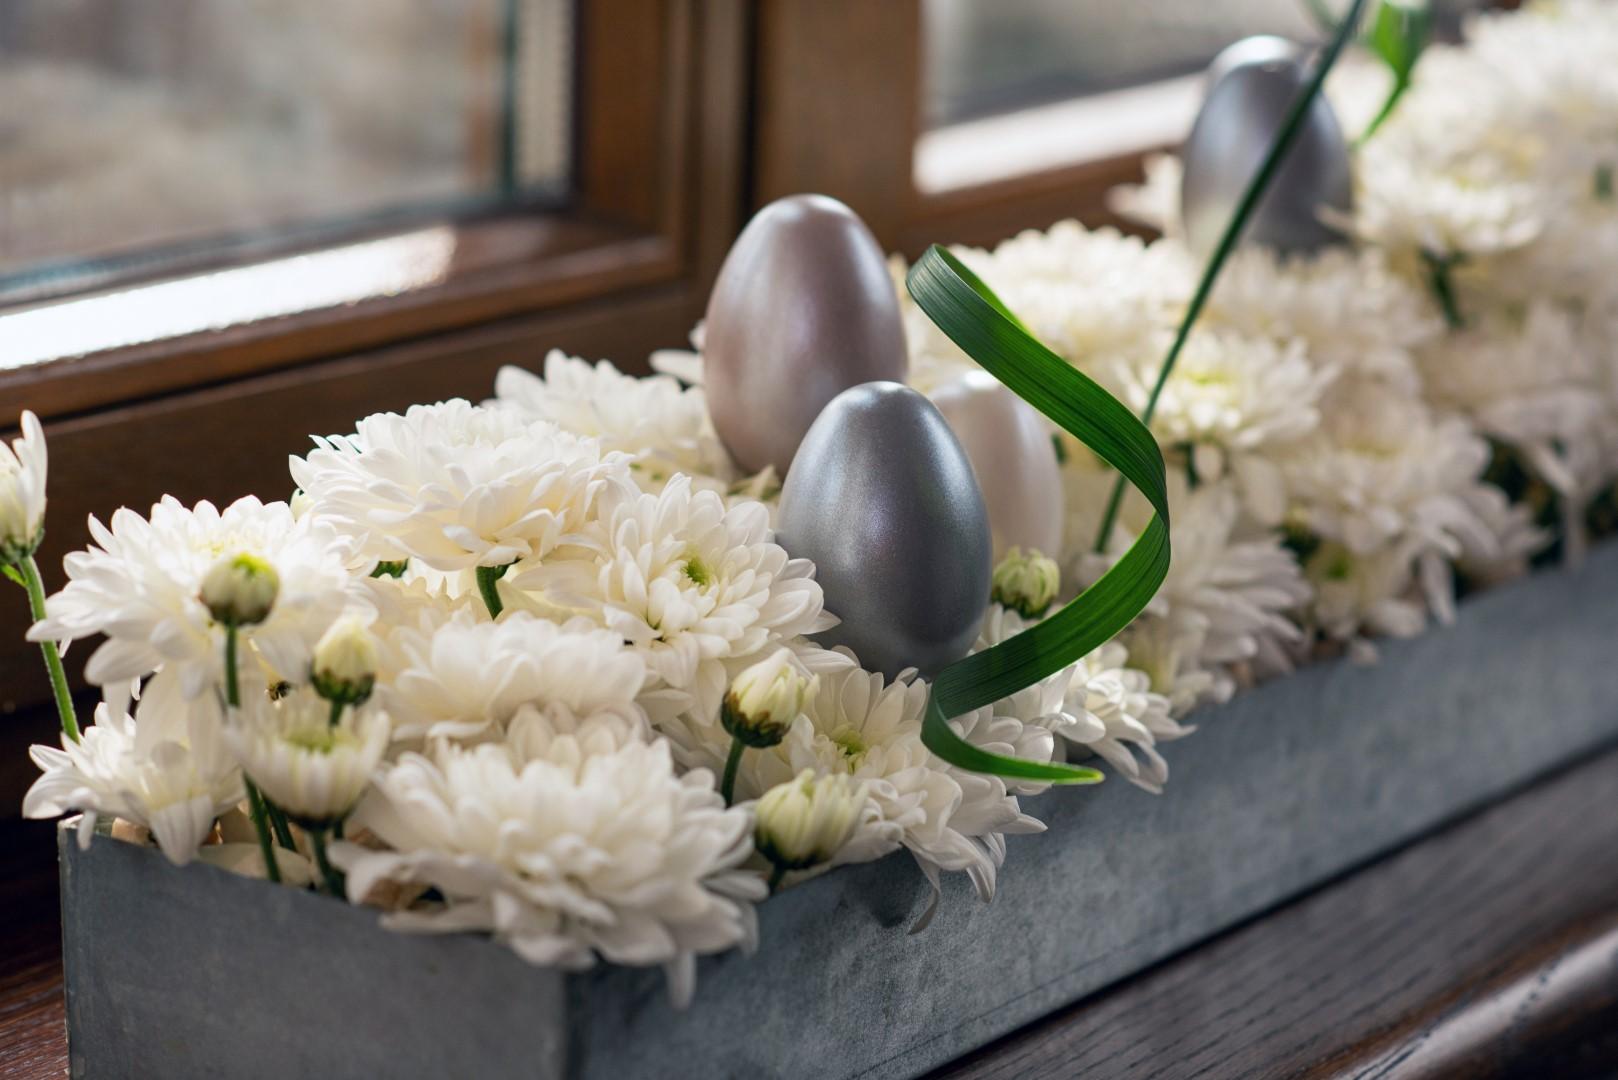 Pina Colada chrysanthemum chryzantema Wielkanoc wiosna